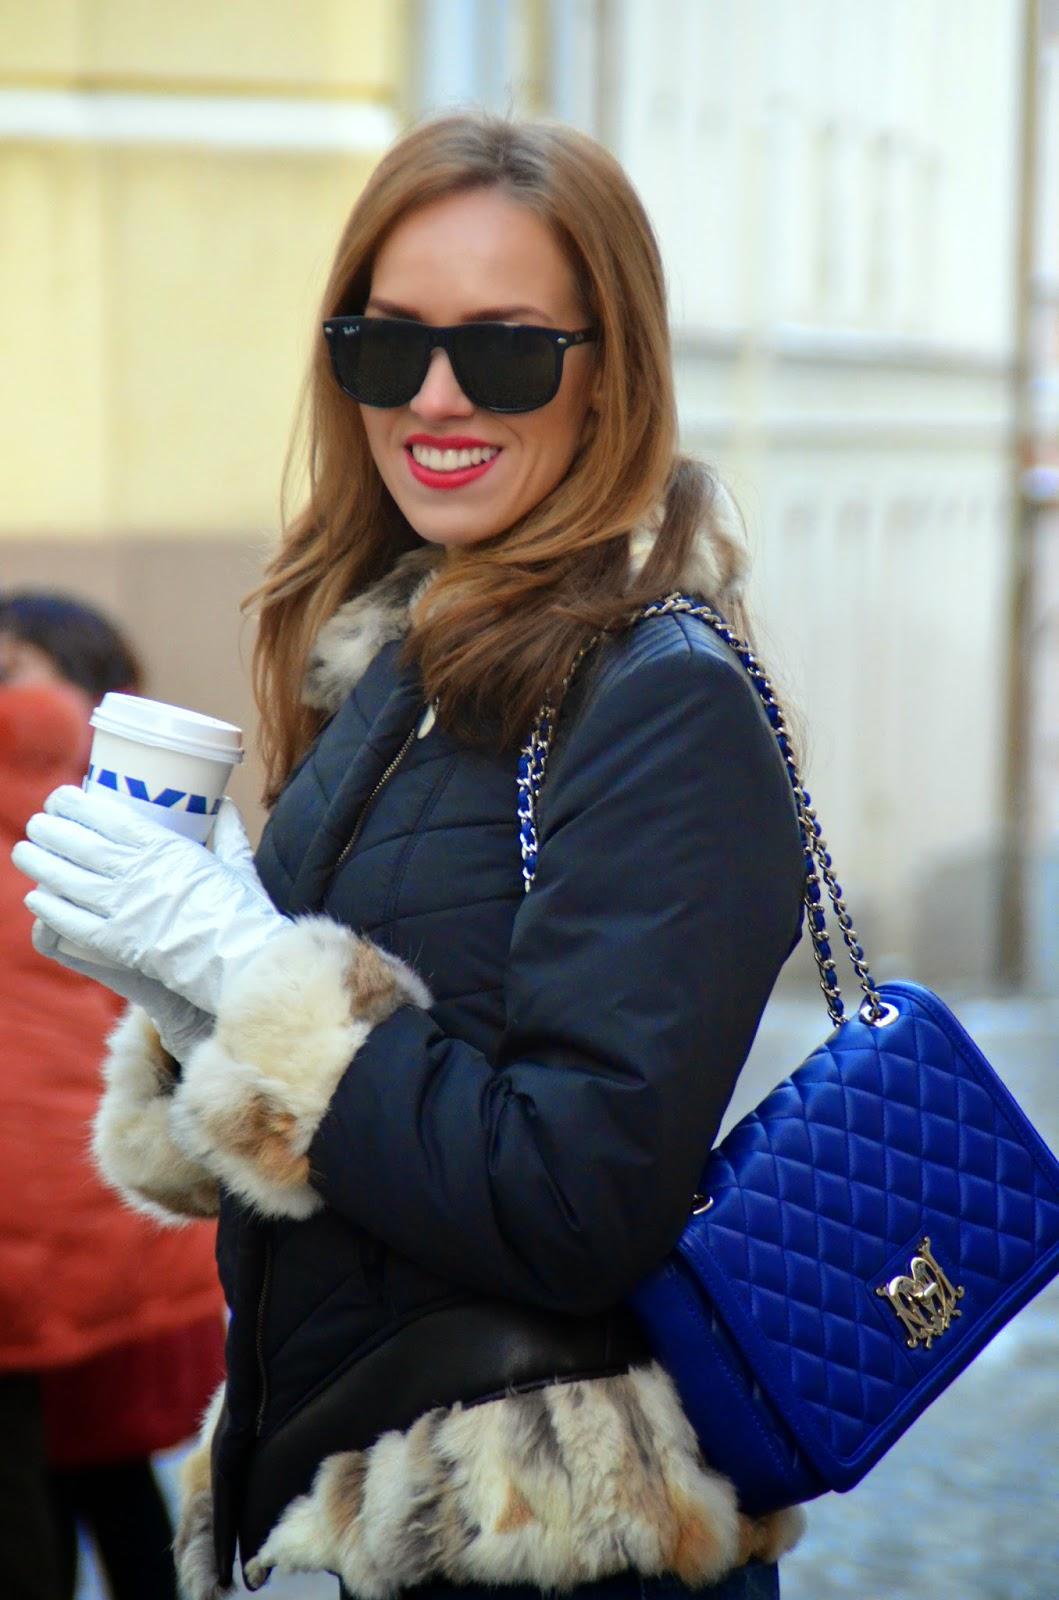 ray-ban-sunglasses-blue-moschino-bag-fur-coat kristjaana mere